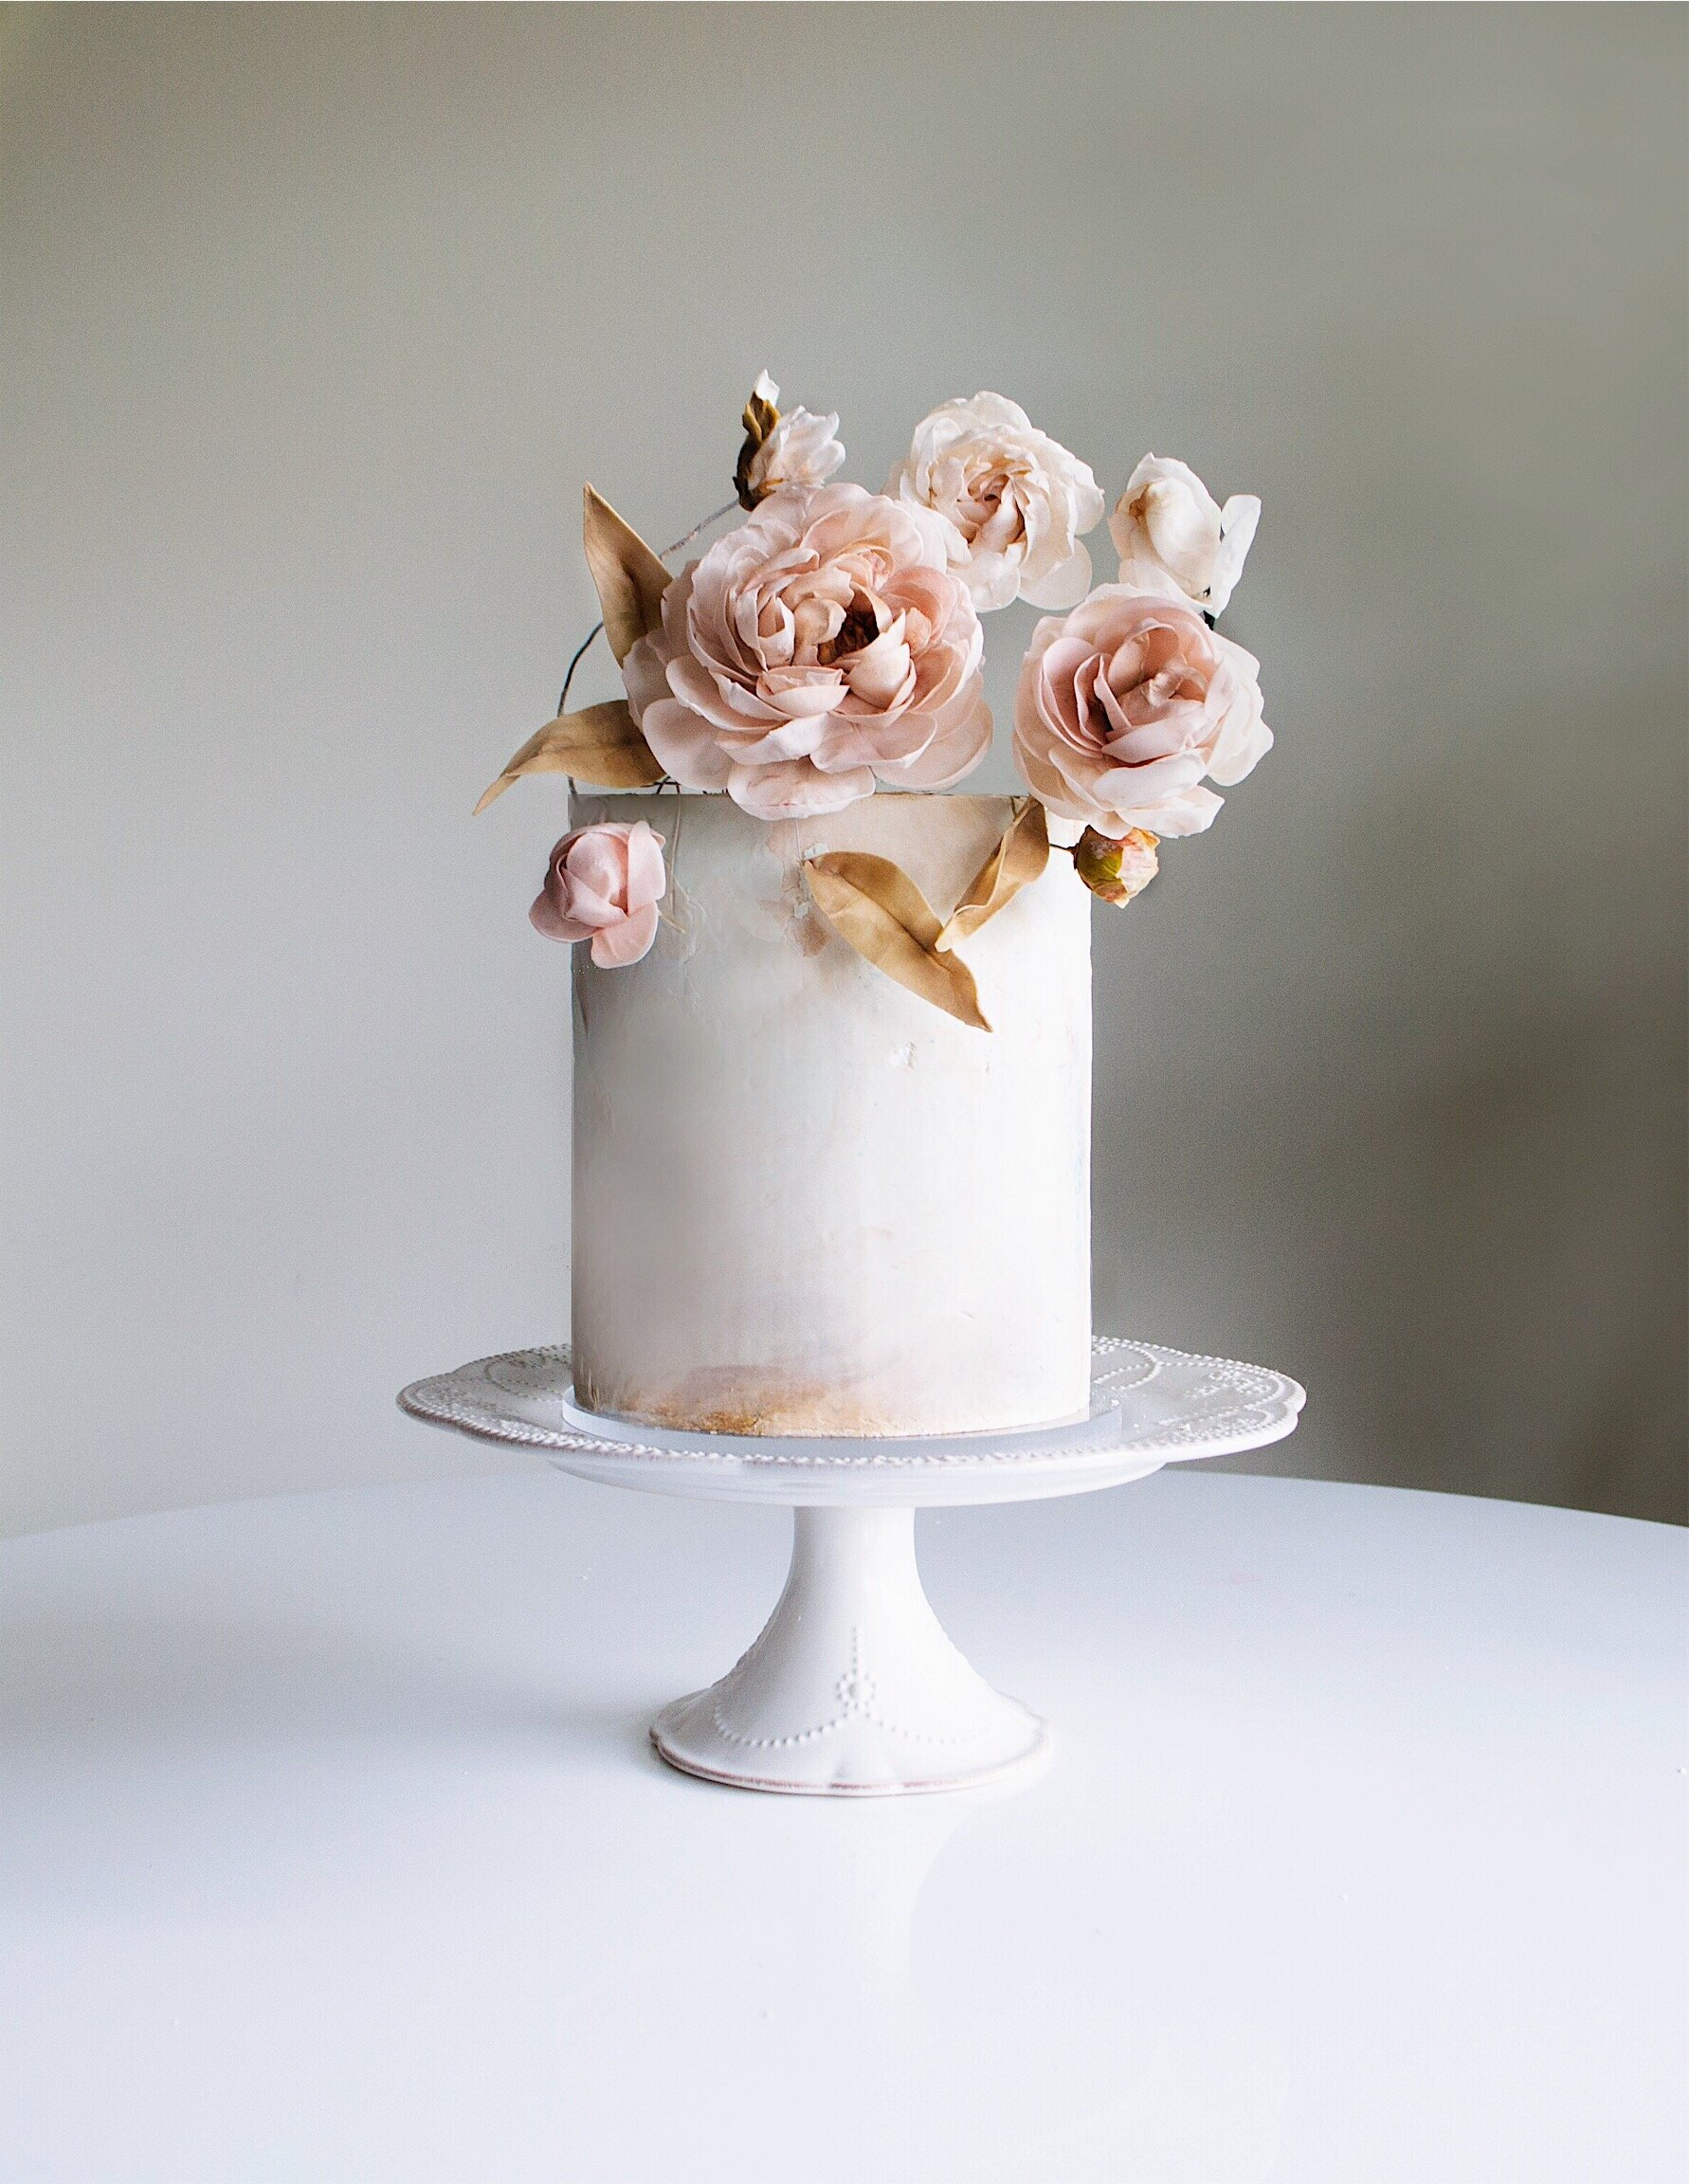 Cynthia Irani - cake designer - cynzcakes - original design.jpg